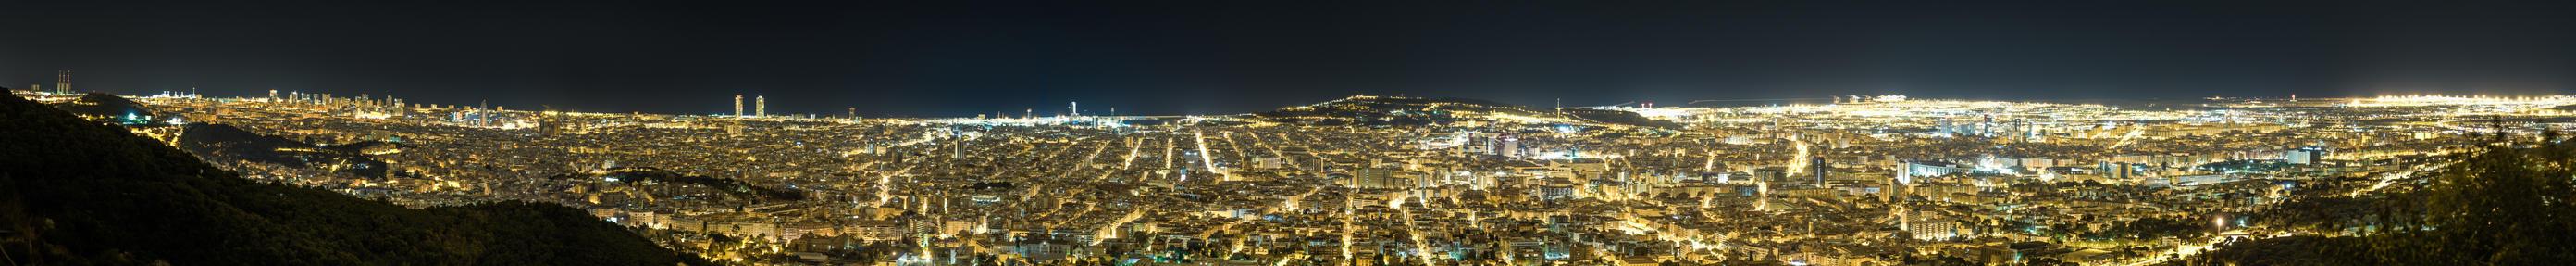 Panorama Barcelona by IoanBalasanu